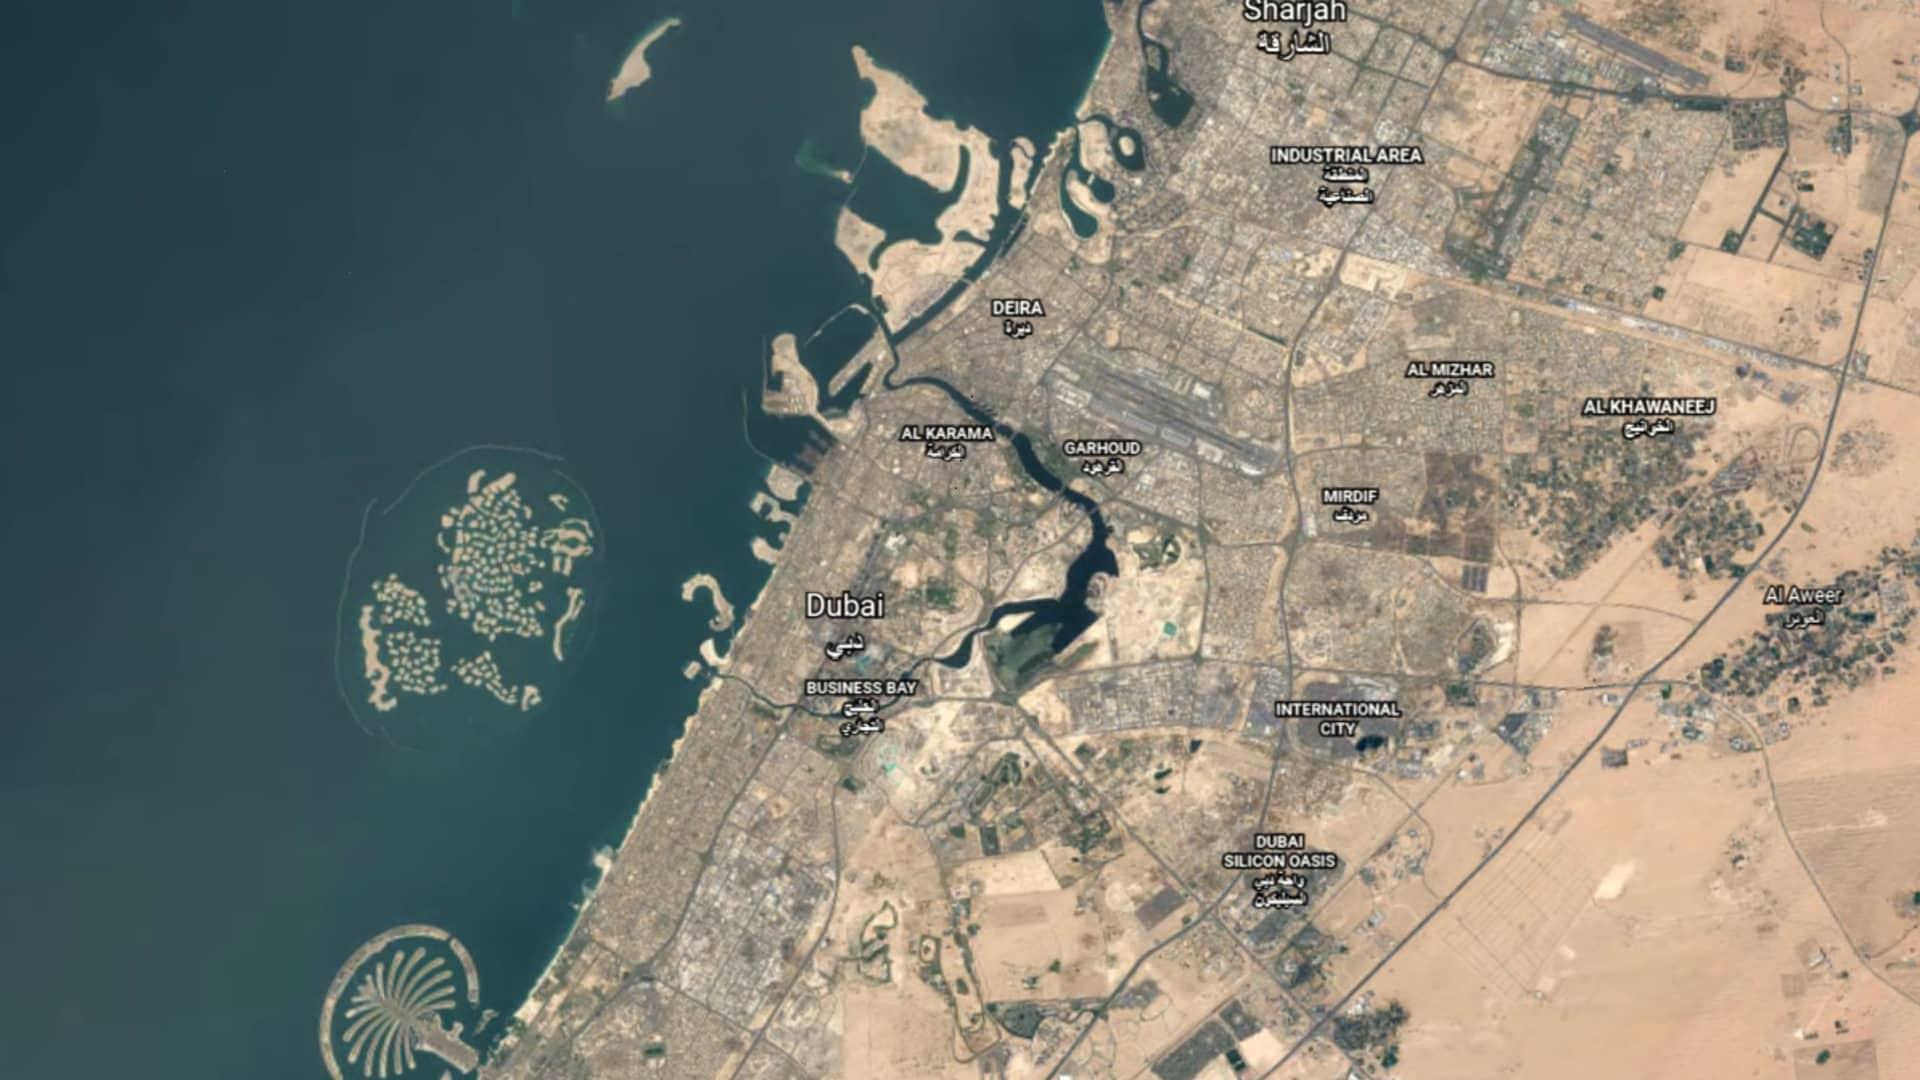 Dubai in 2020